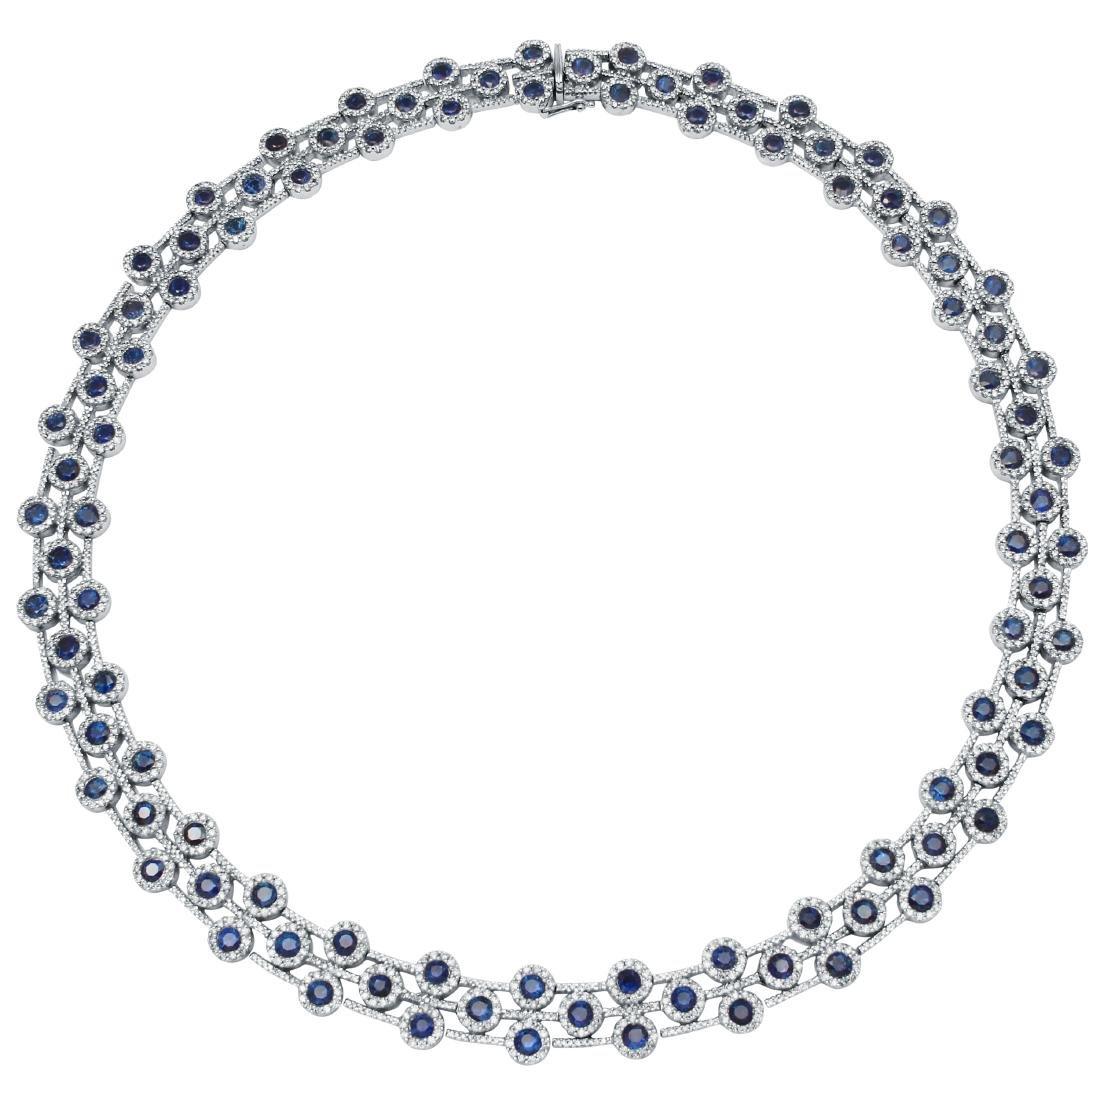 26.09 CTW 14K White Gold Ladies Necklace - REF-1171Y7X